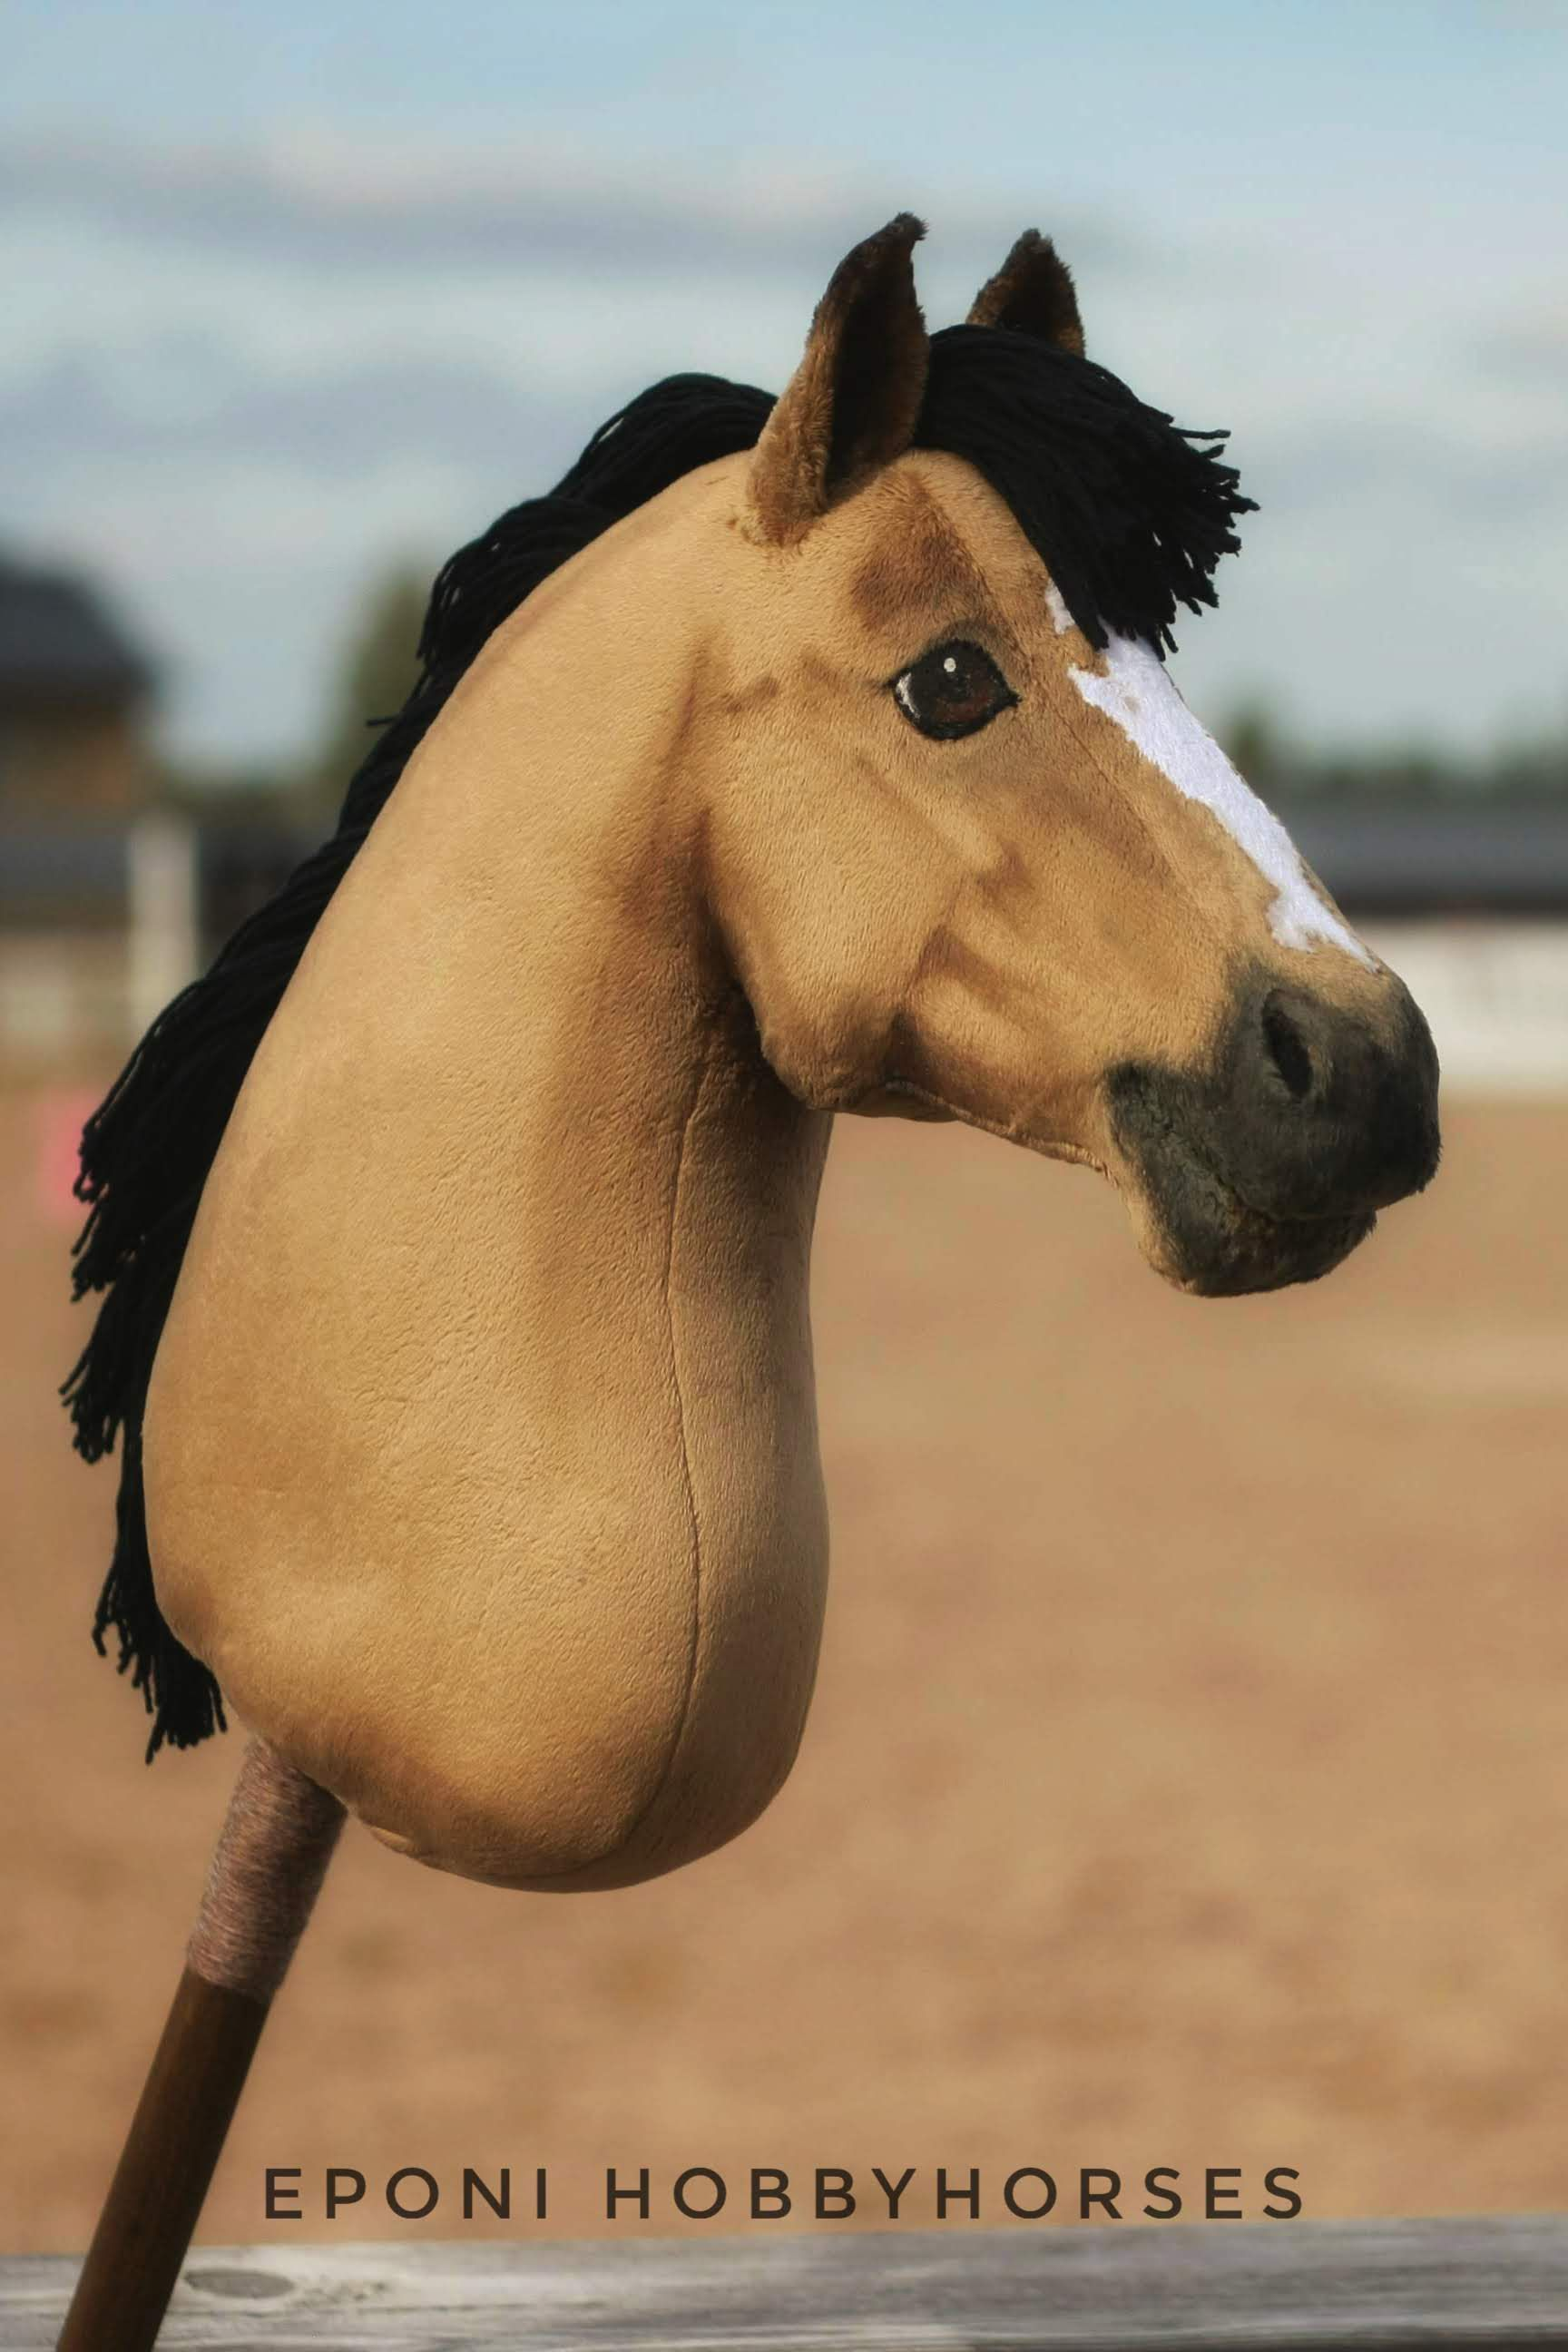 Eponi Hobbyhorses Horses Hobby Horse Stick Horses [ 2592 x 1728 Pixel ]